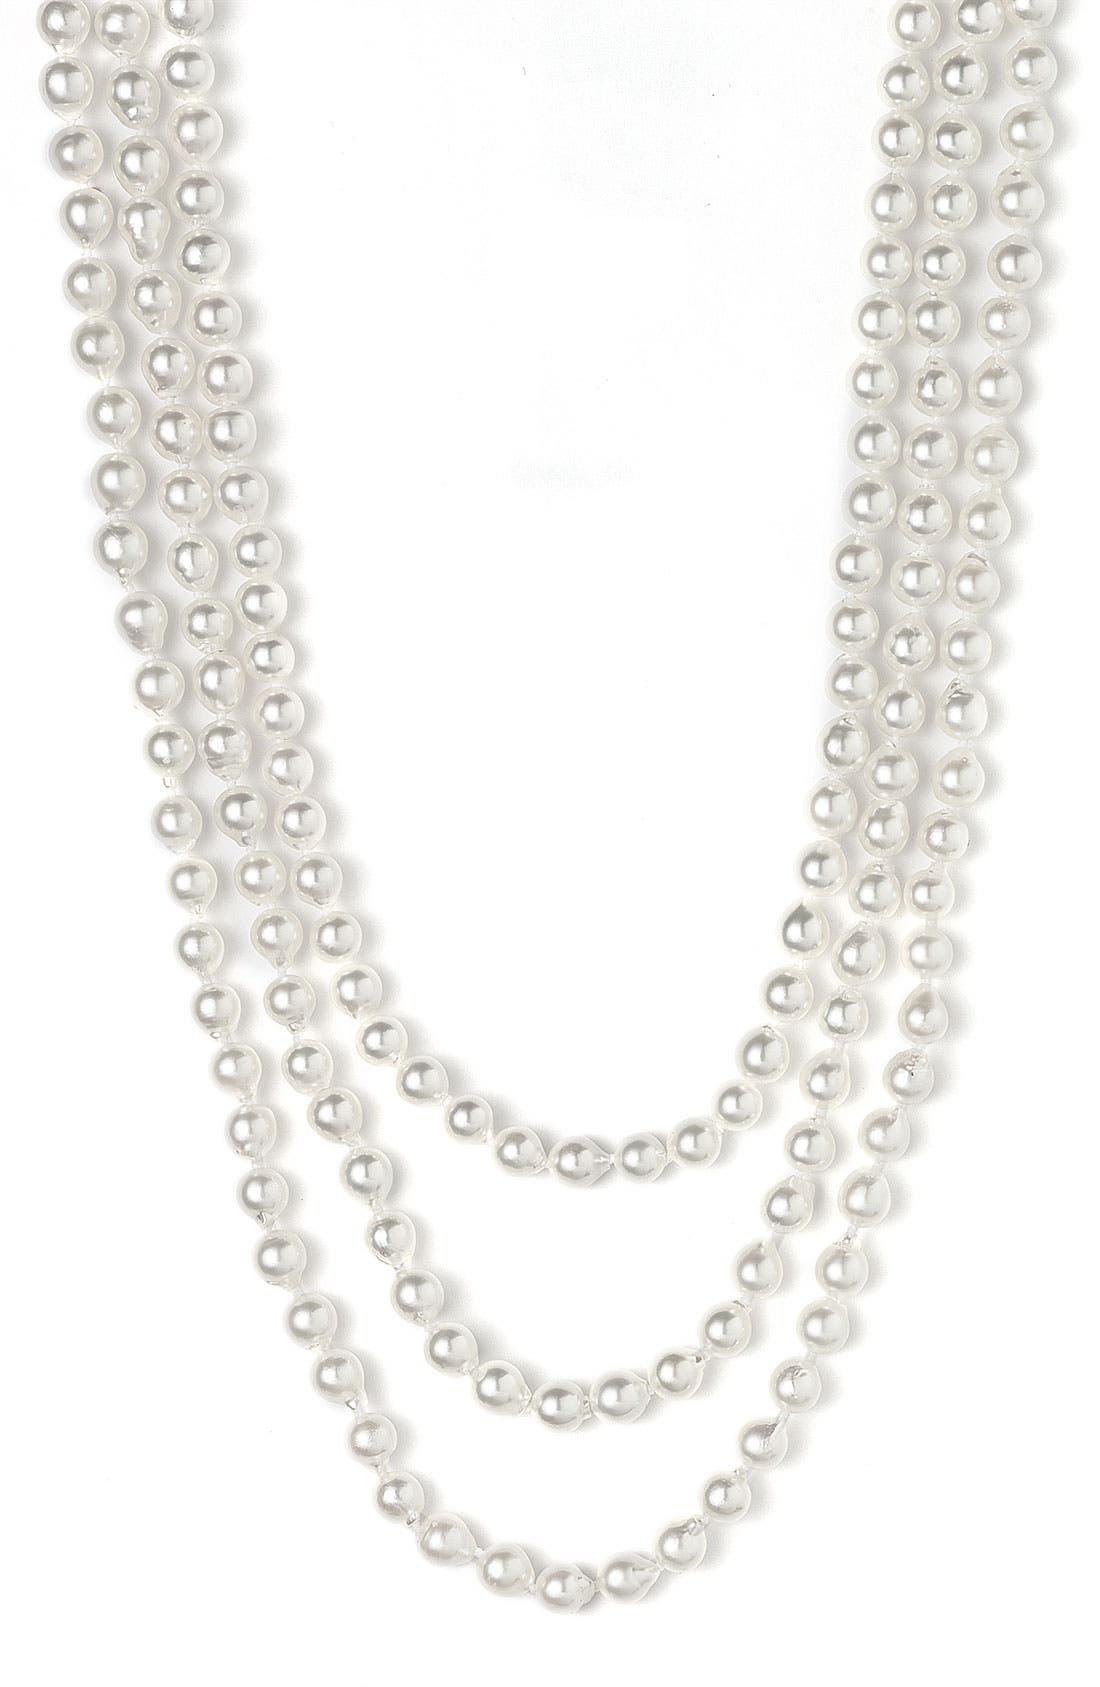 Main Image - Mastoloni Akoya 7mm Pearl Extra Long Strand Necklace